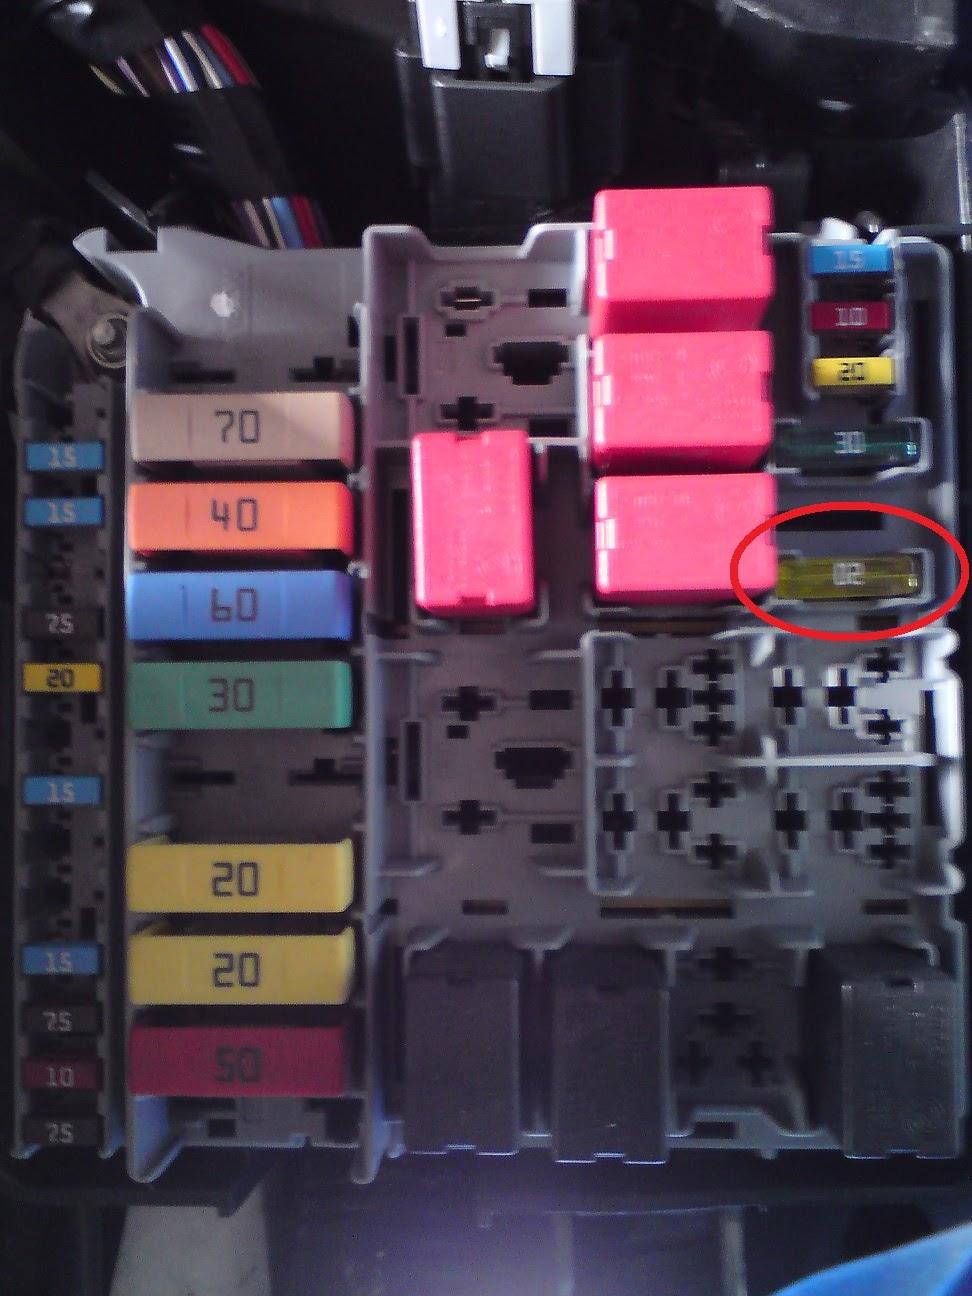 [DIAGRAM_4PO]  XZ_5319] Fiat Bravo Fuse Box Location Schematic Wiring   Fuse Box Fiat Bravo 2007      Anth Proe Tzici Ungo Awni Eopsy Peted Oidei Vira Mohammedshrine Librar  Wiring 101